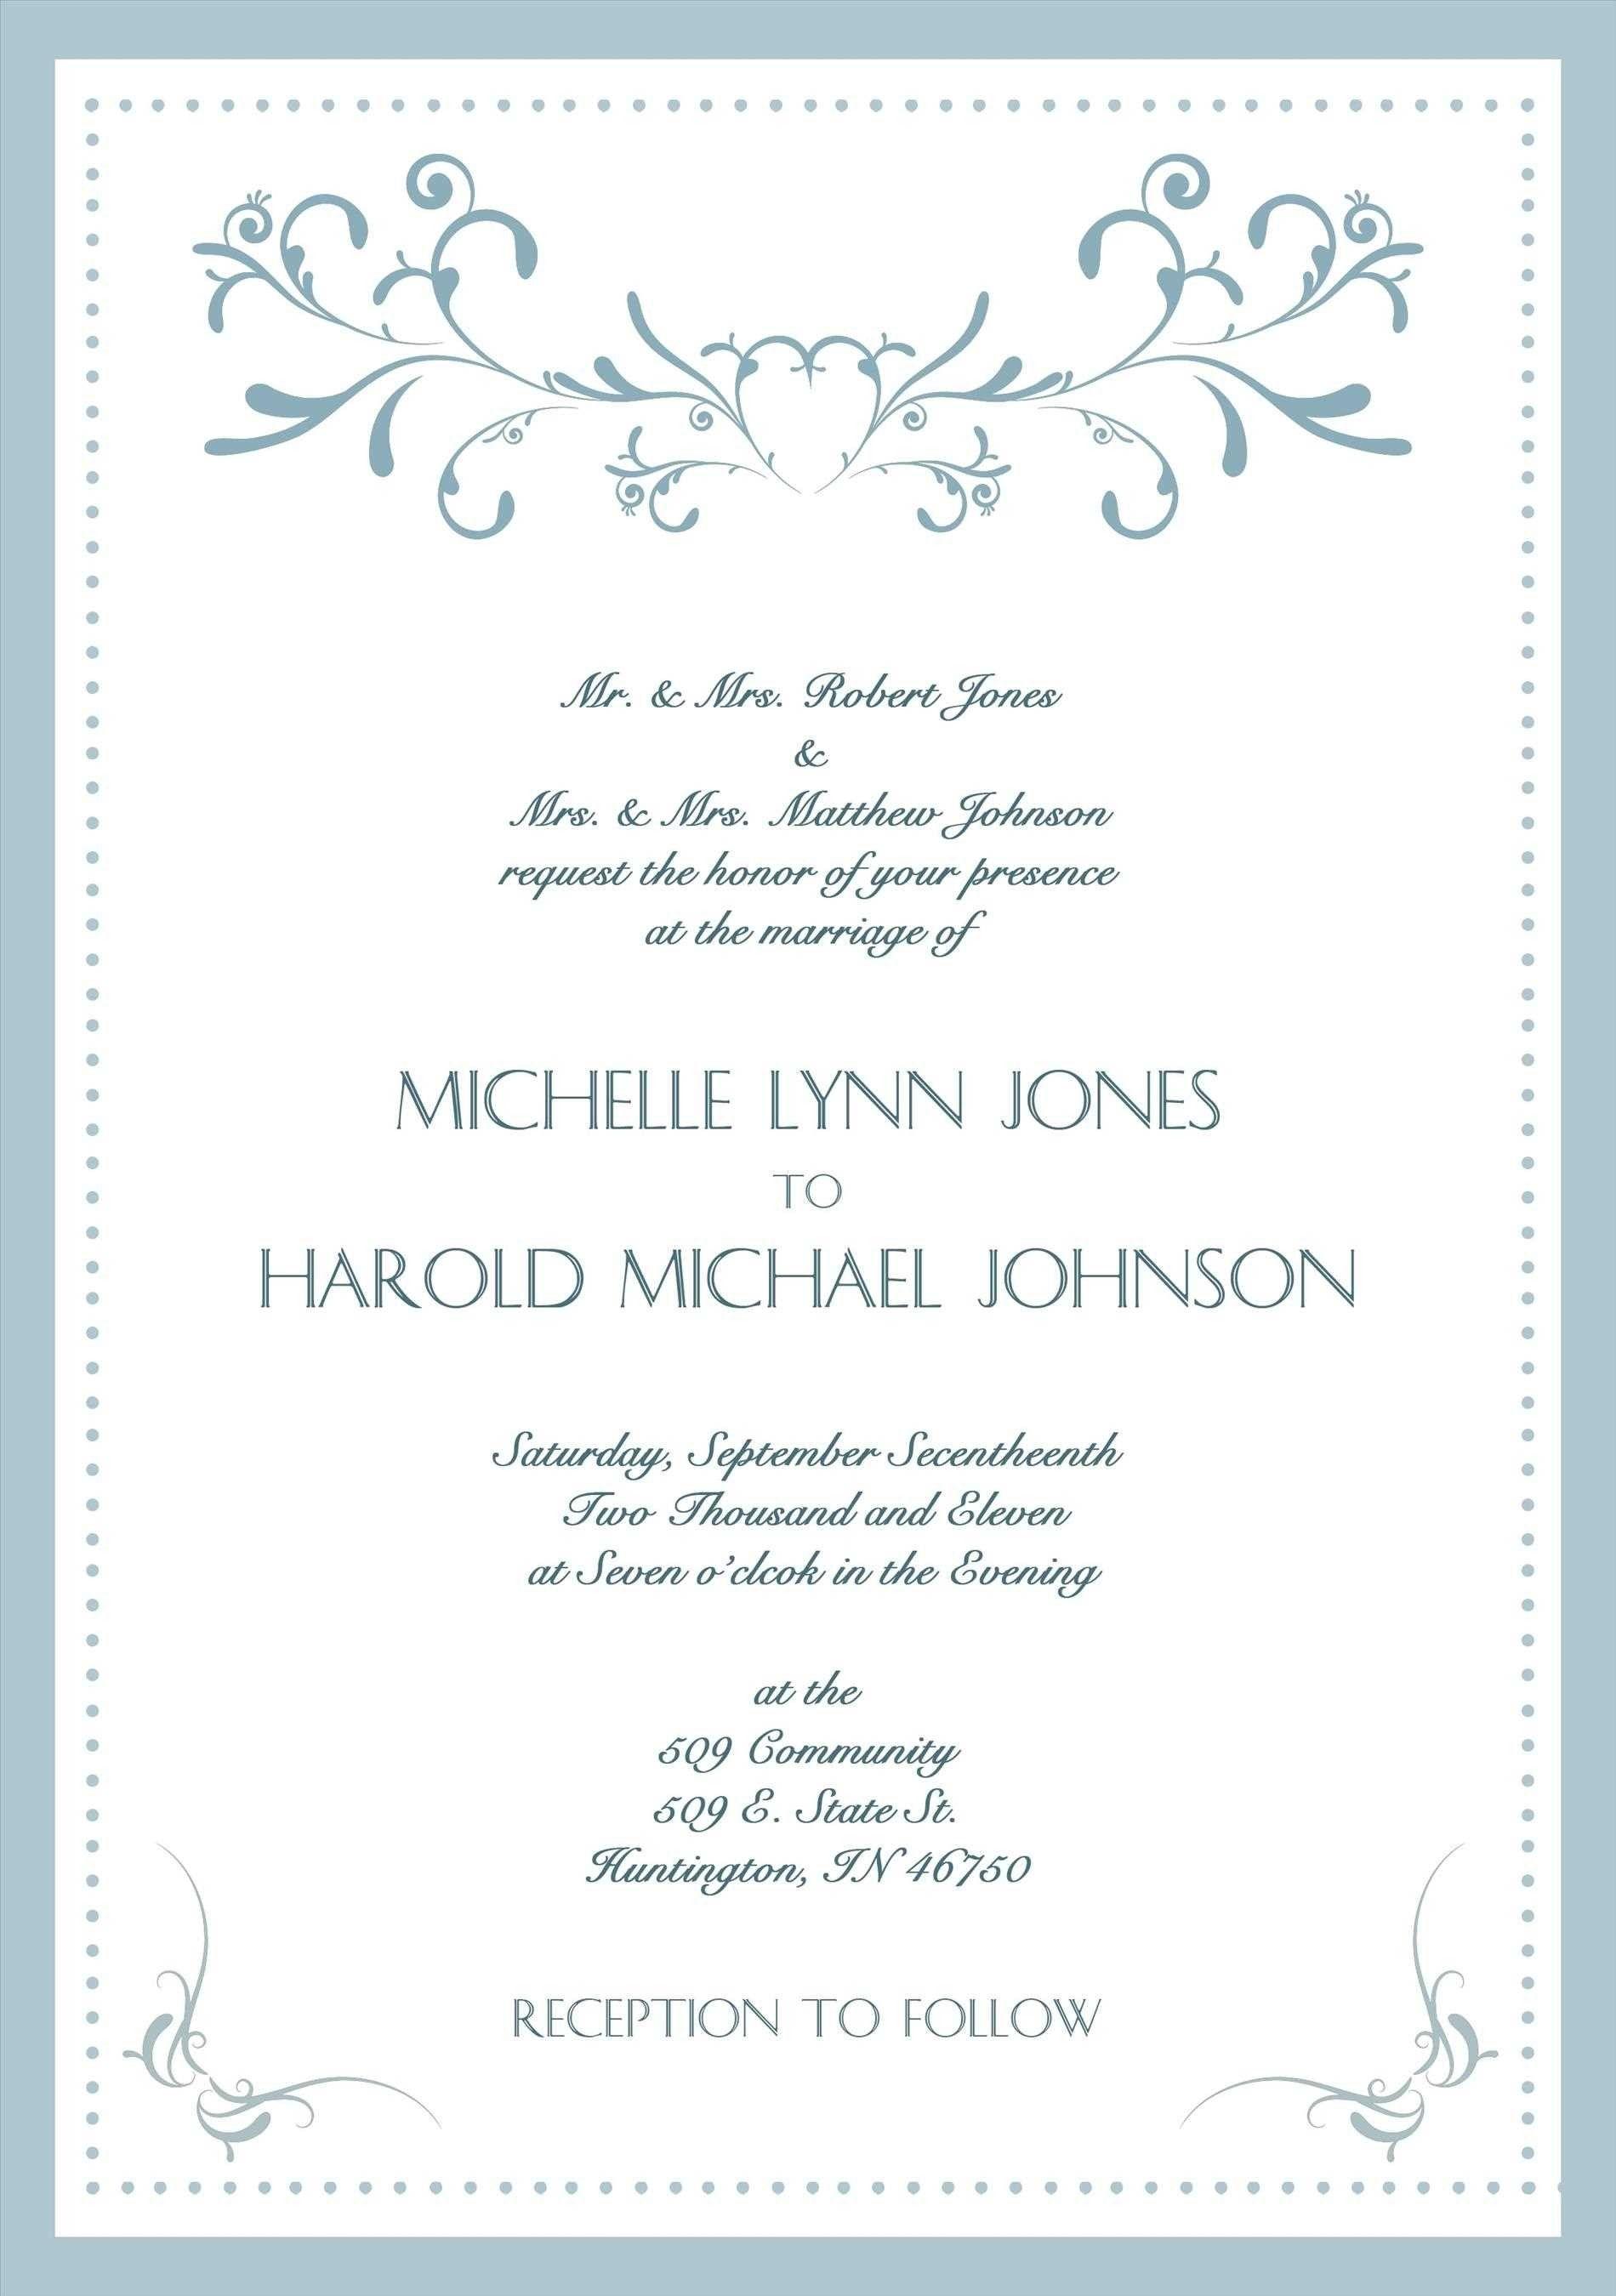 002 Stunning Formal Wedding Invitation Template High Resolution  Templates Email Format Wording FreeFull